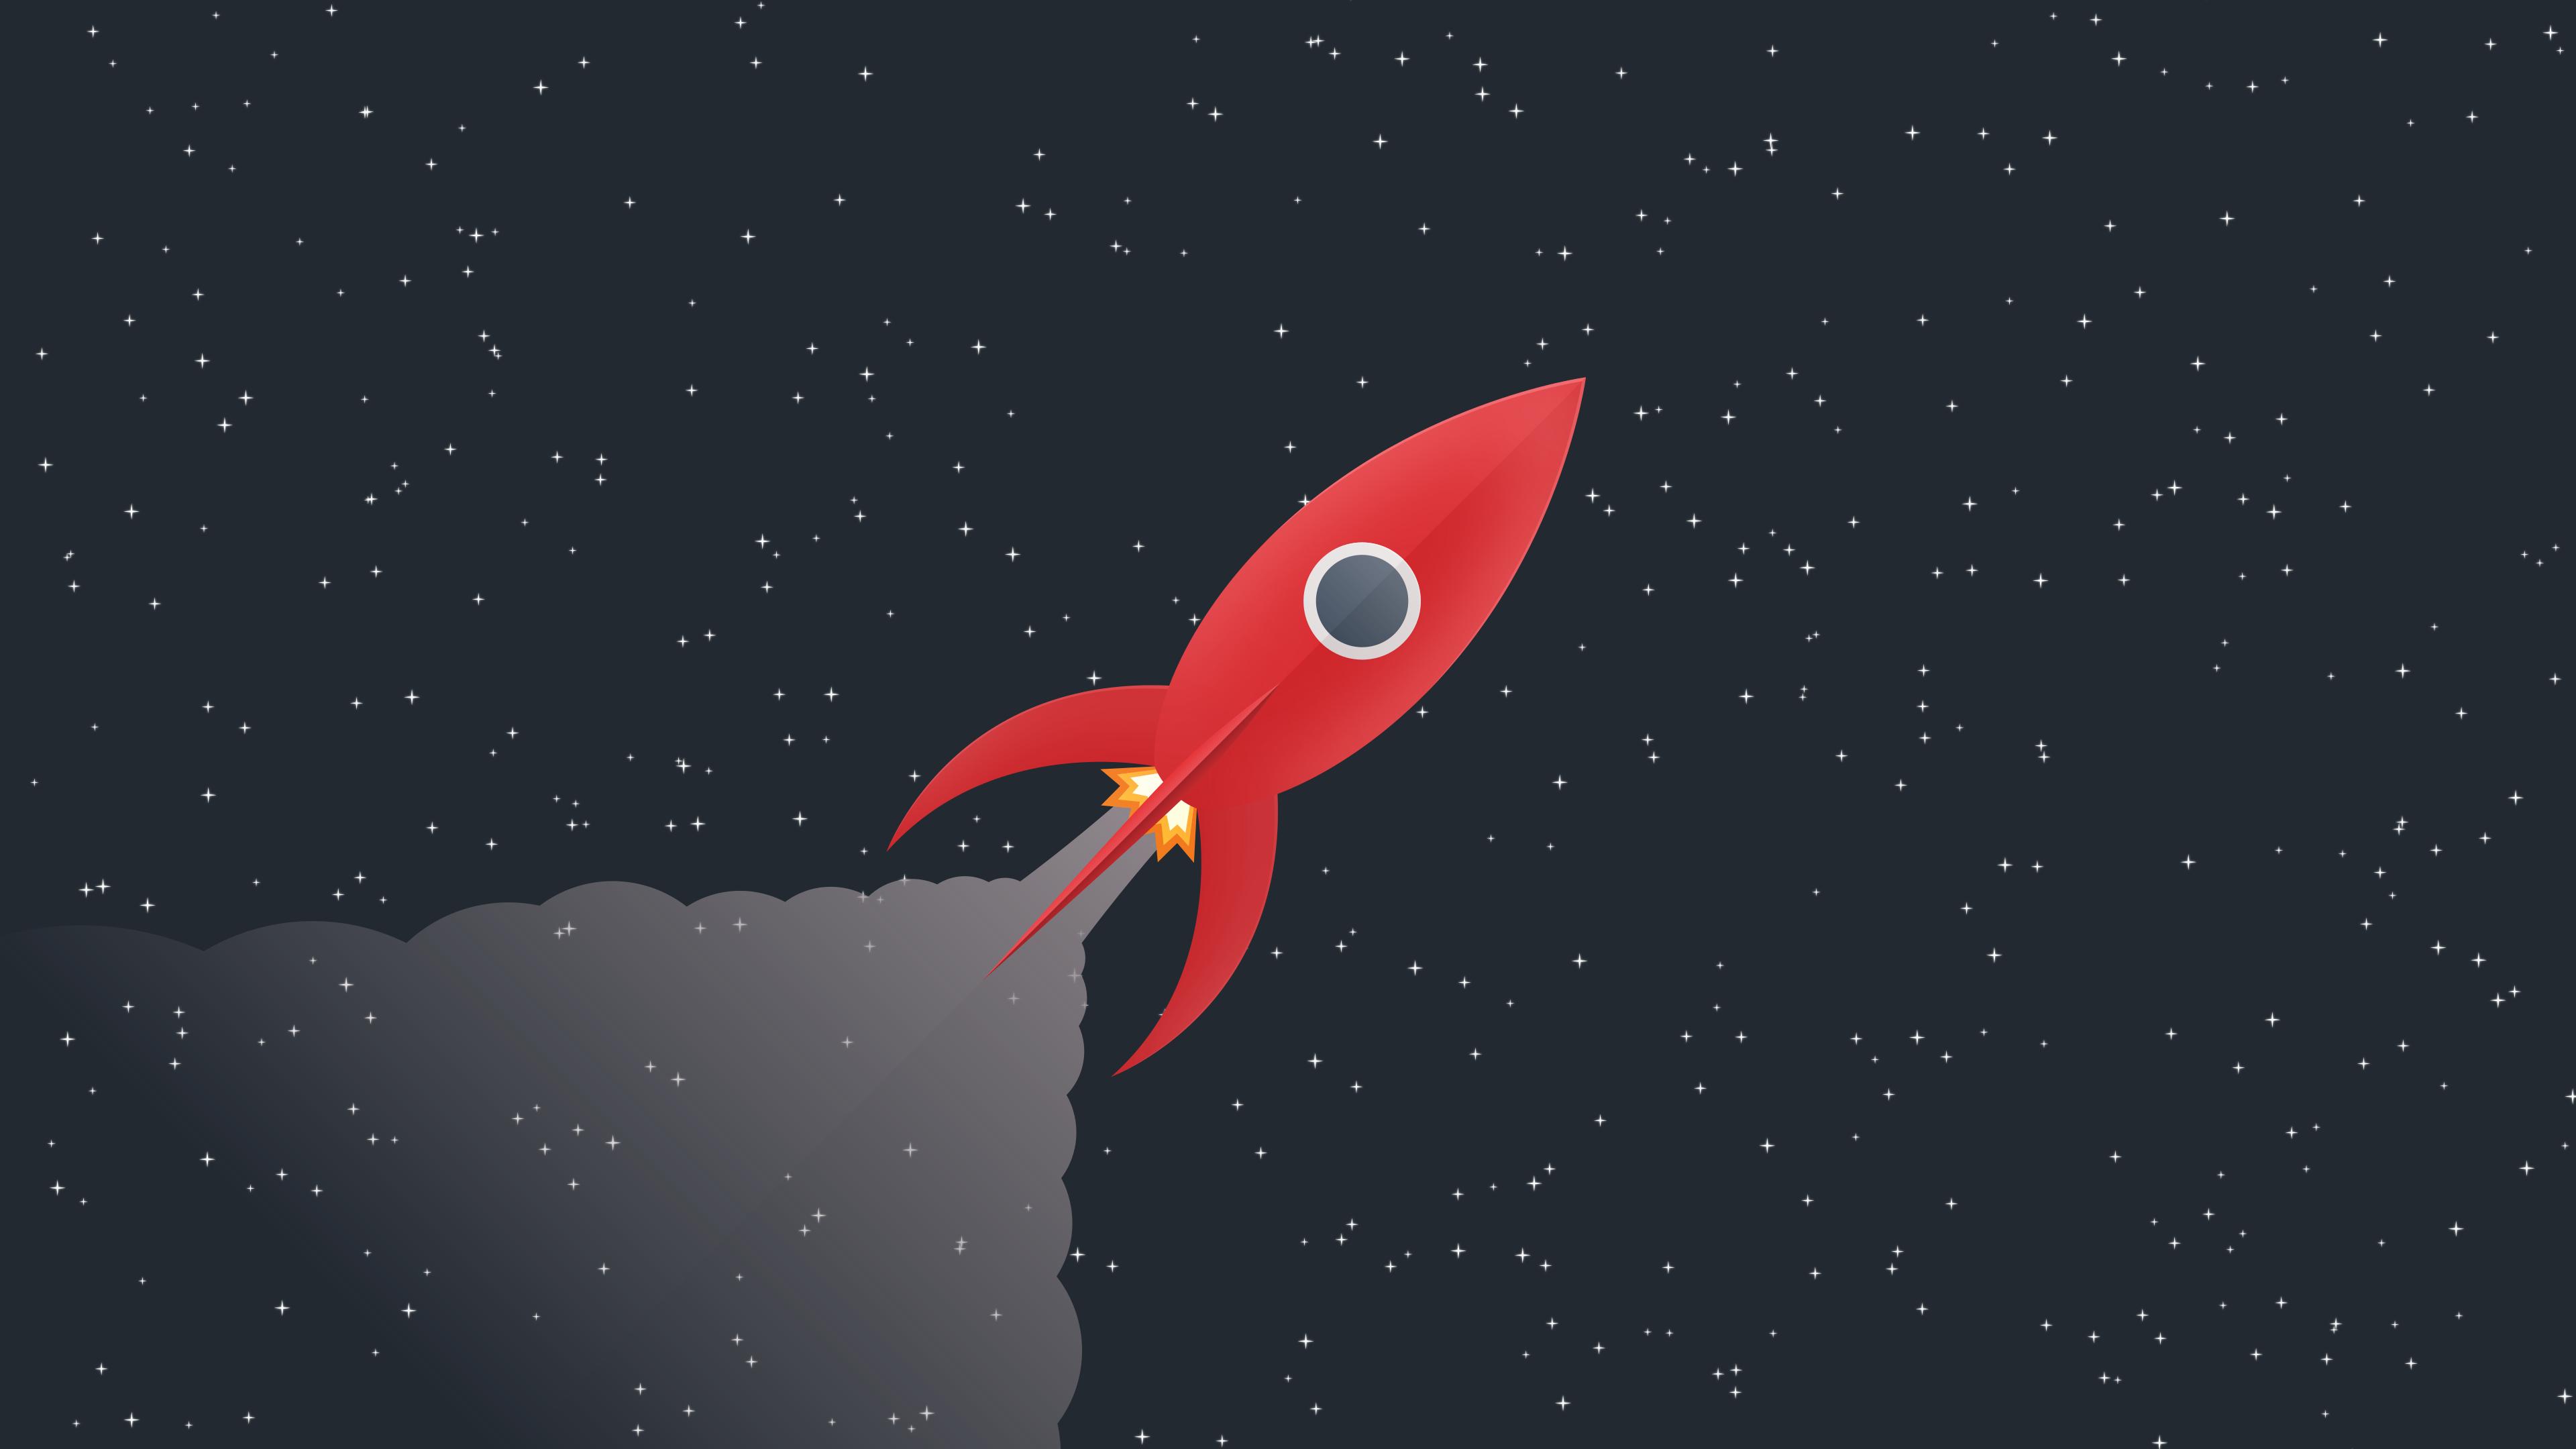 1600x900 Minimal Rocket In Space 1600x900 Resolution